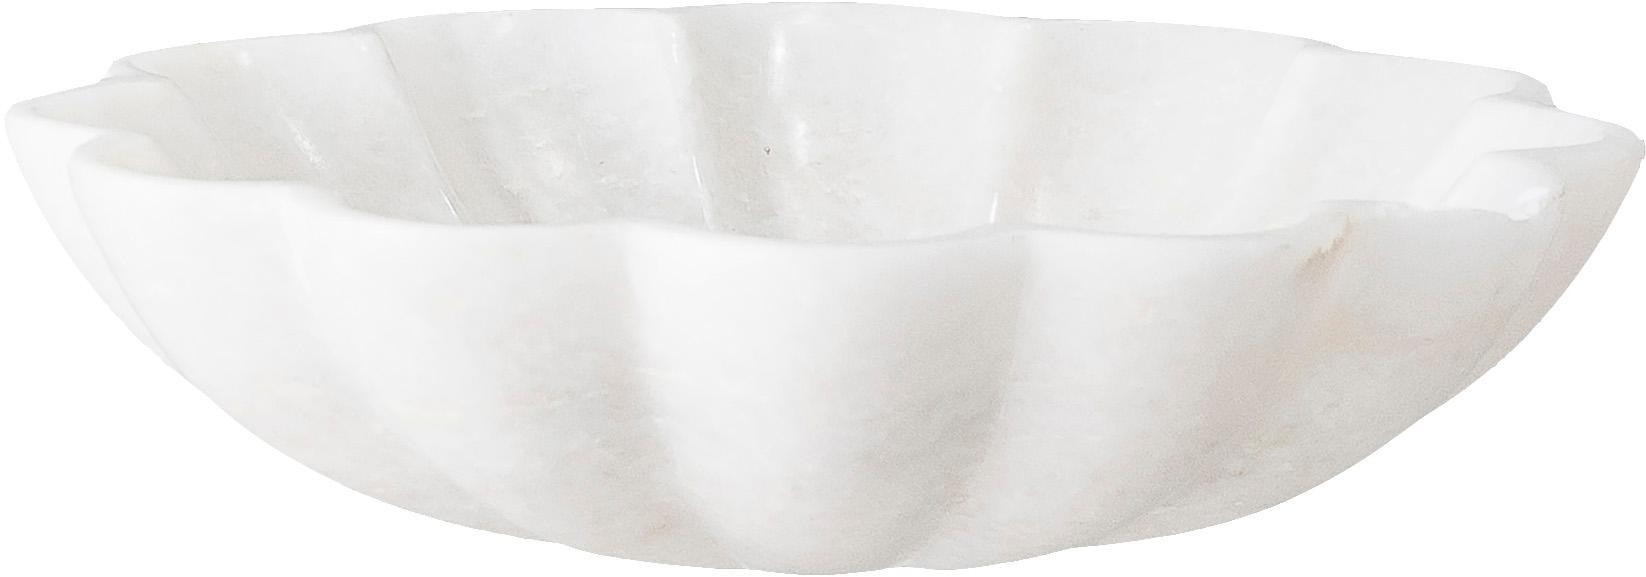 Marmeren zeephouder Mussel, Marmer, Wit, Ø 15 x H 4 cm